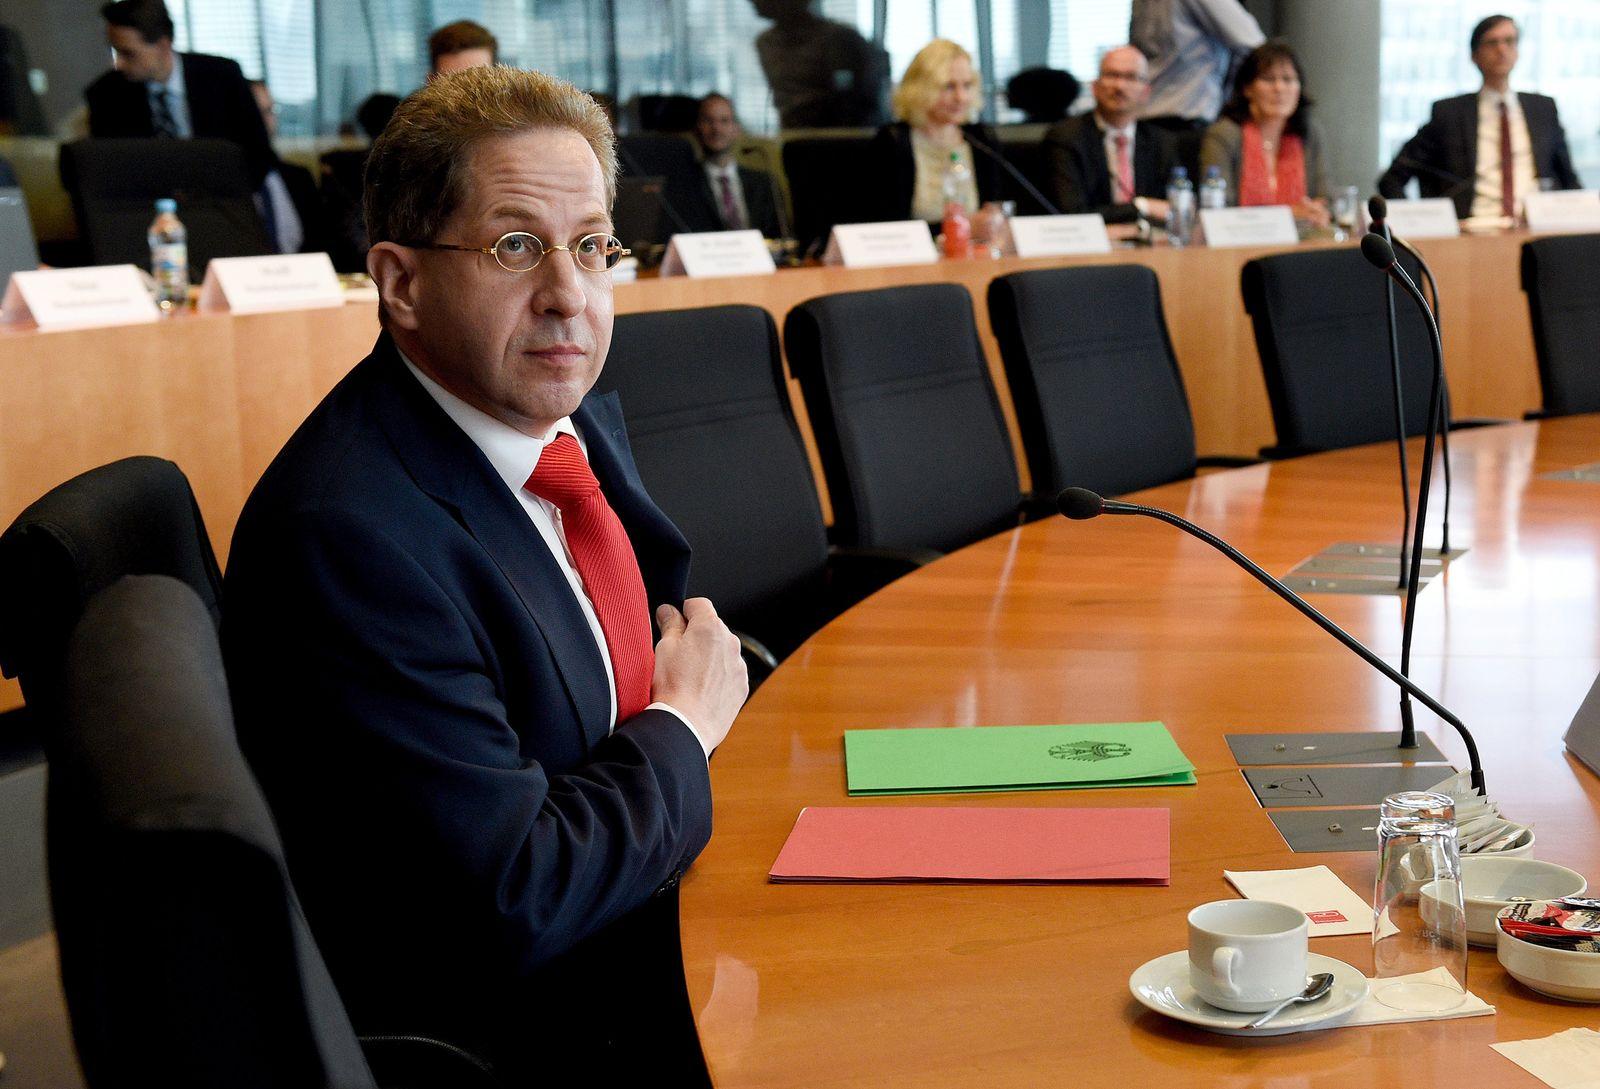 NSA Untersuchungsausschuss Hans-Georg Maaßen BfV